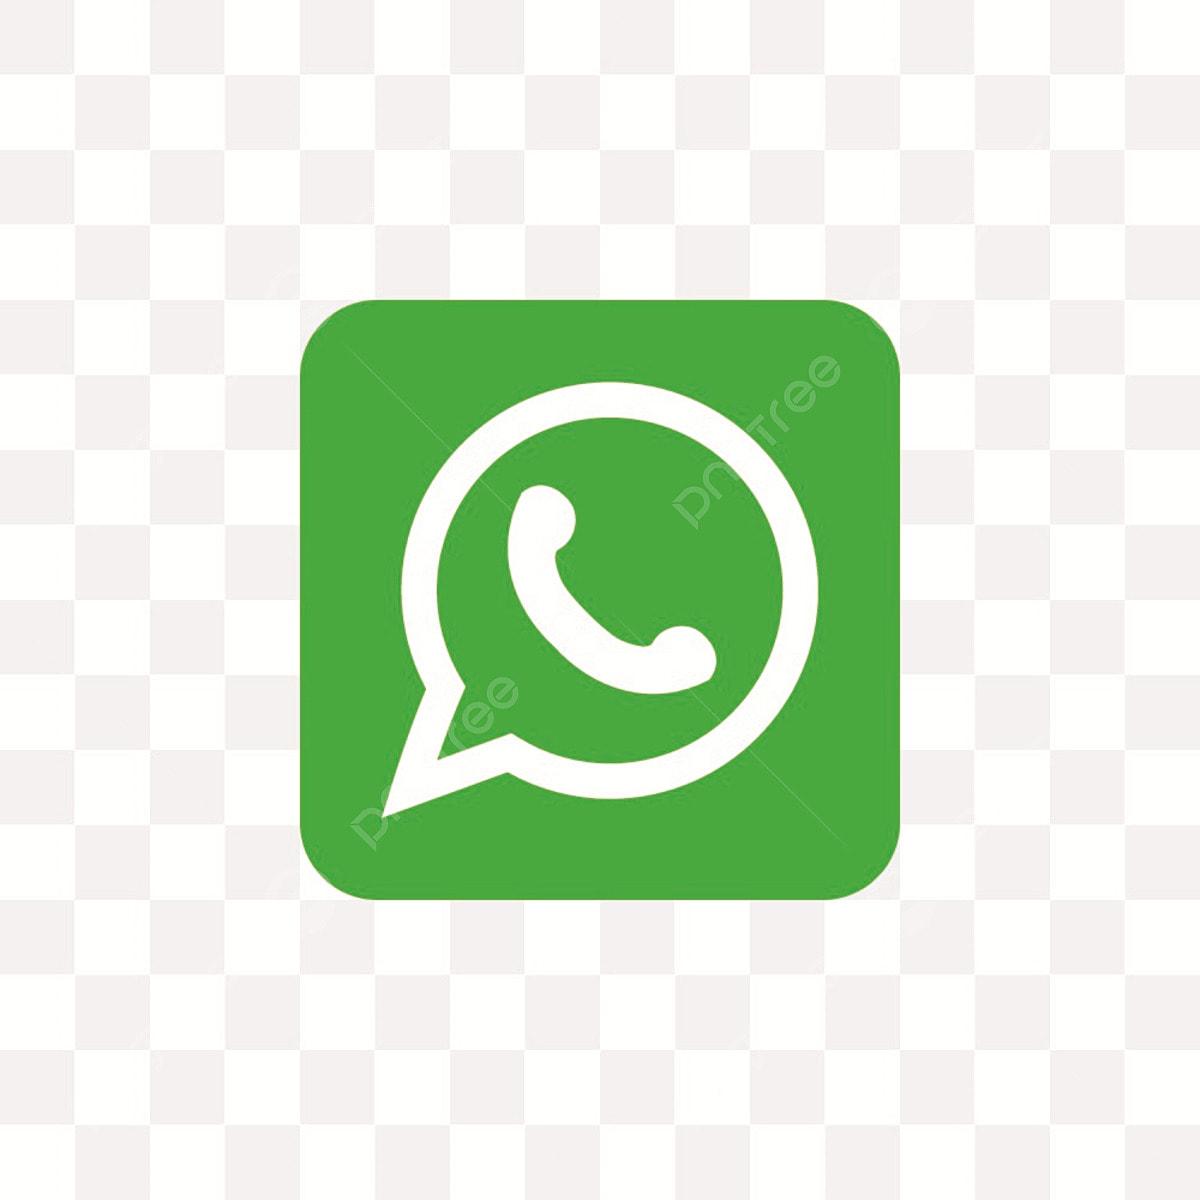 Whatsapp Icon Logo, Whatsapp Logo, Whatsapp Icon, Whatsapp